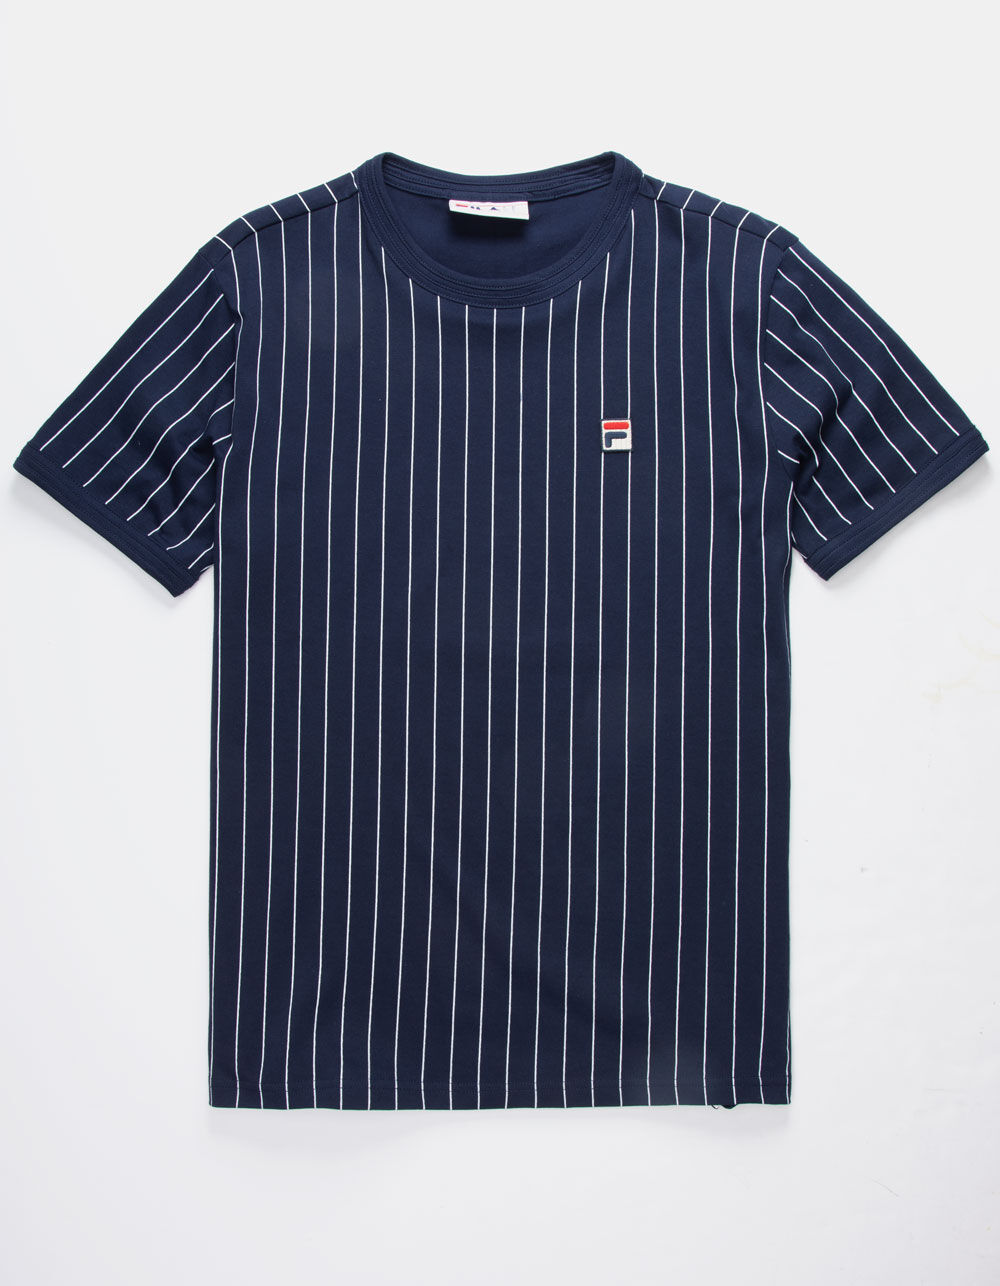 FILA Guilo Navy Stripe T-Shirt